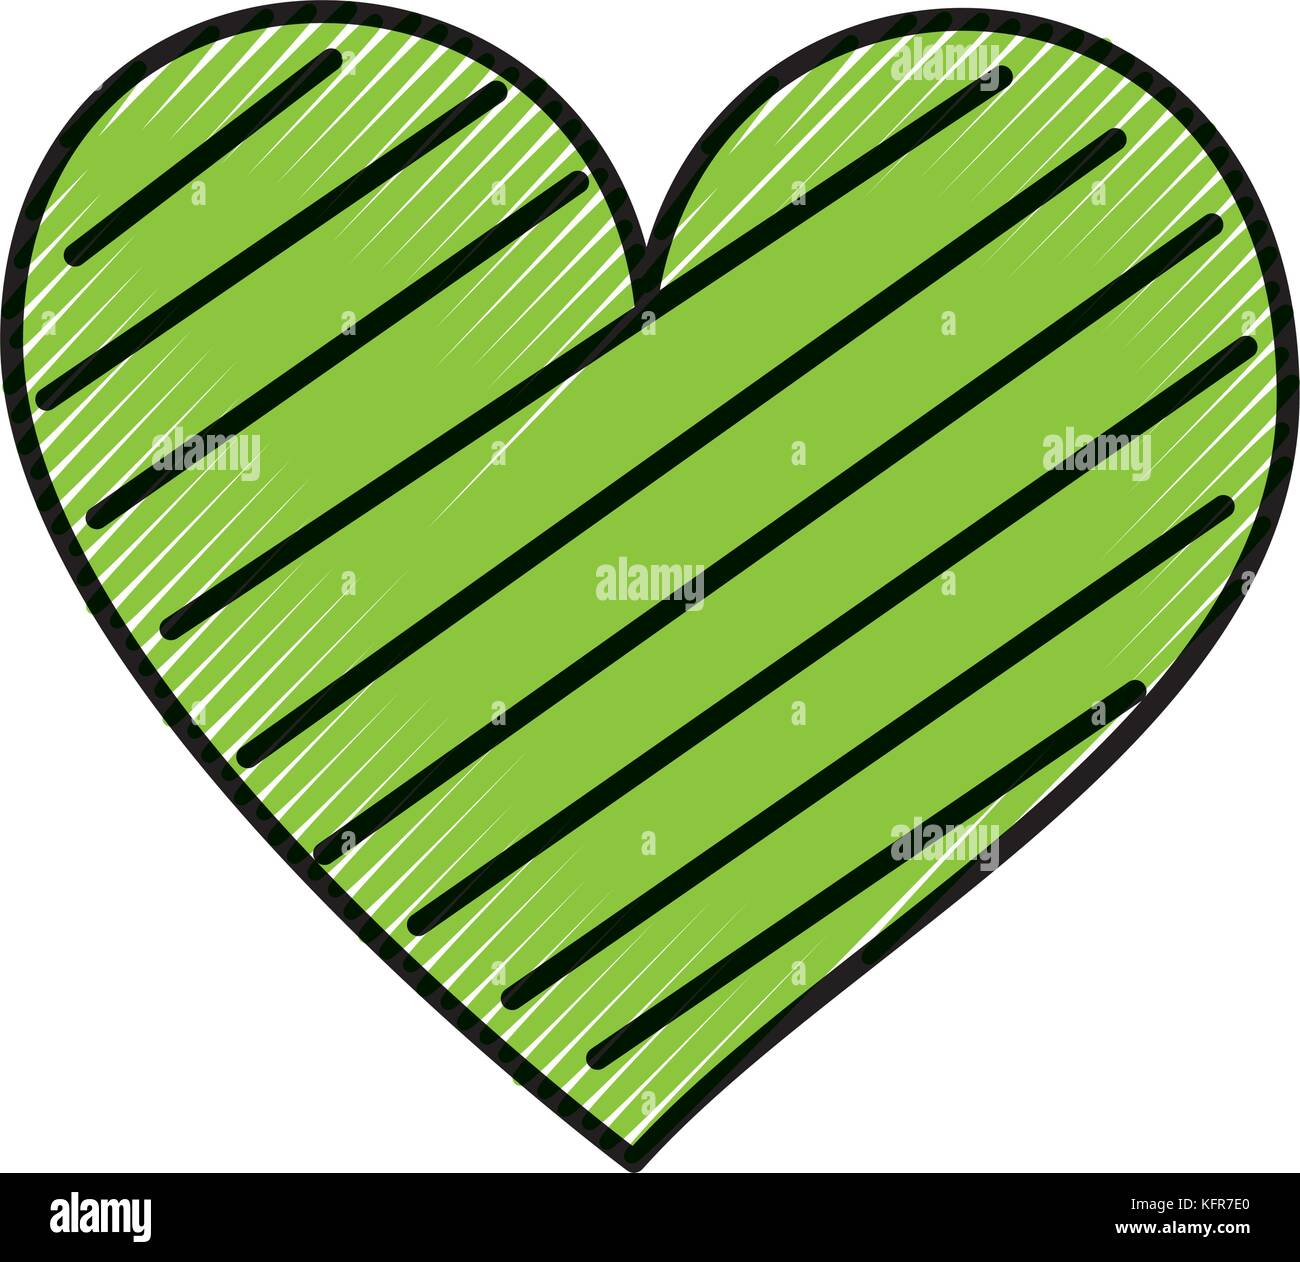 heart love romance passion decorate stripes Stock Vector